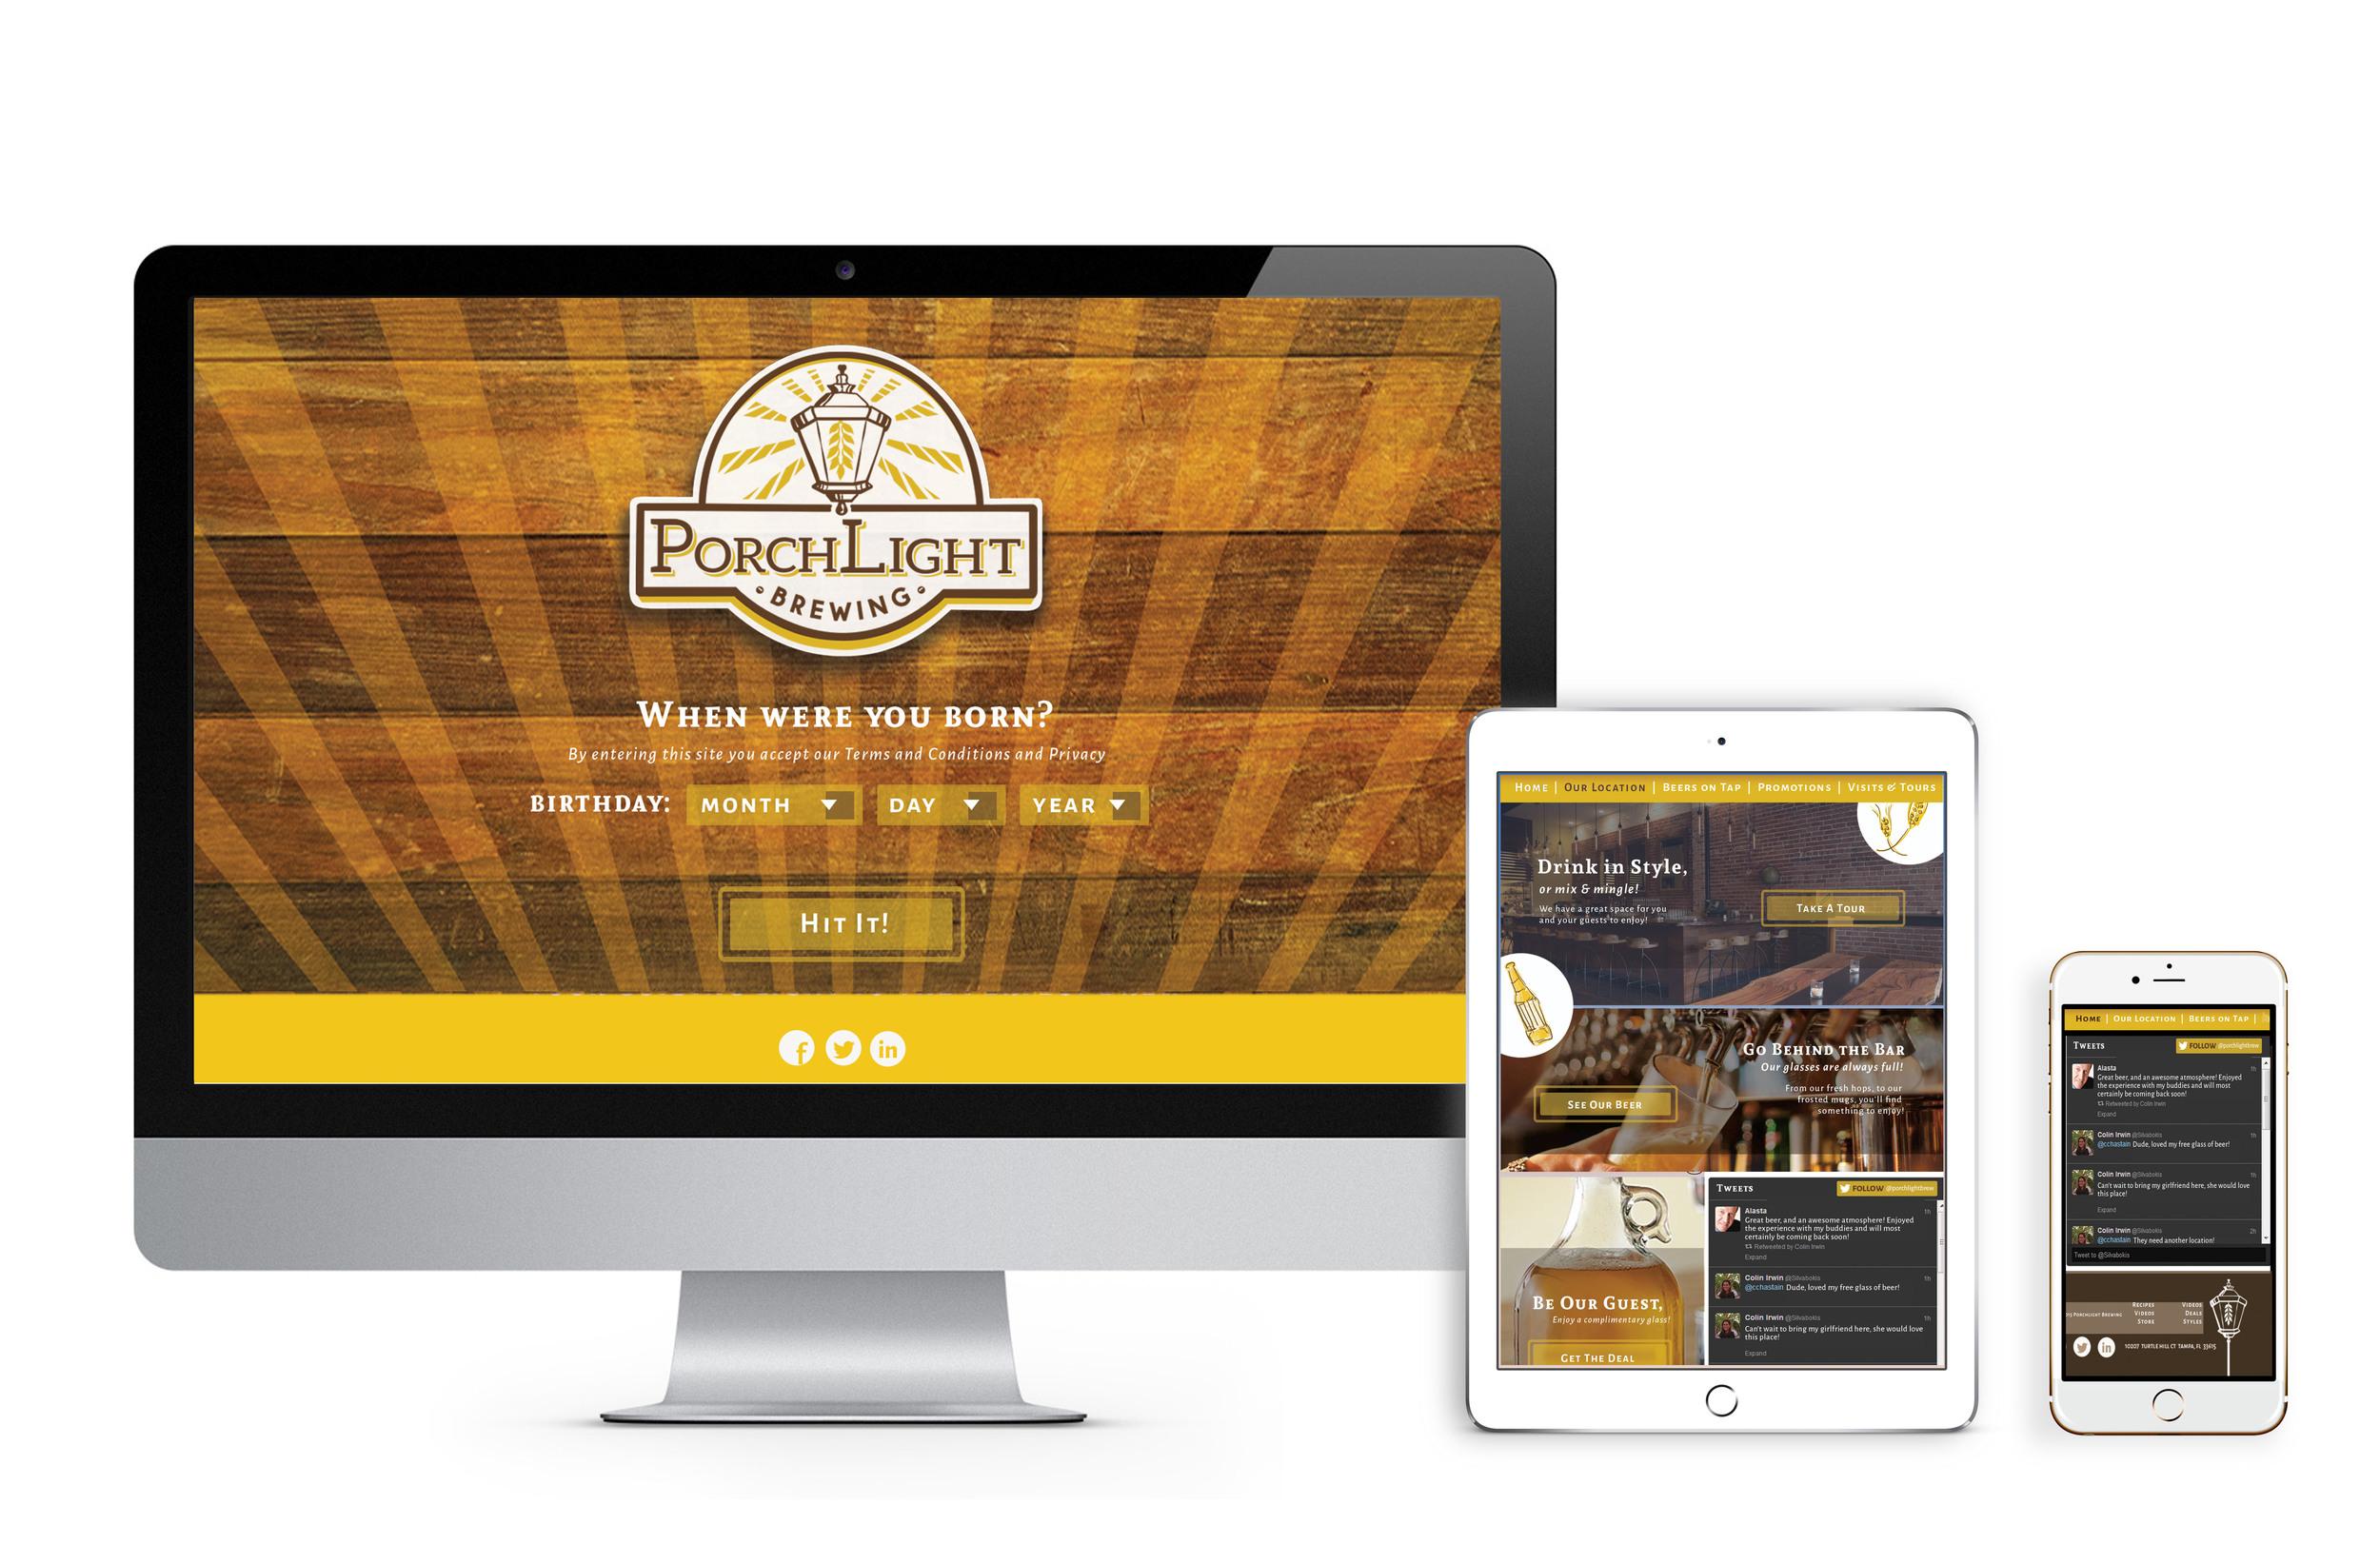 Website Design for PorchLight Brewing Co.